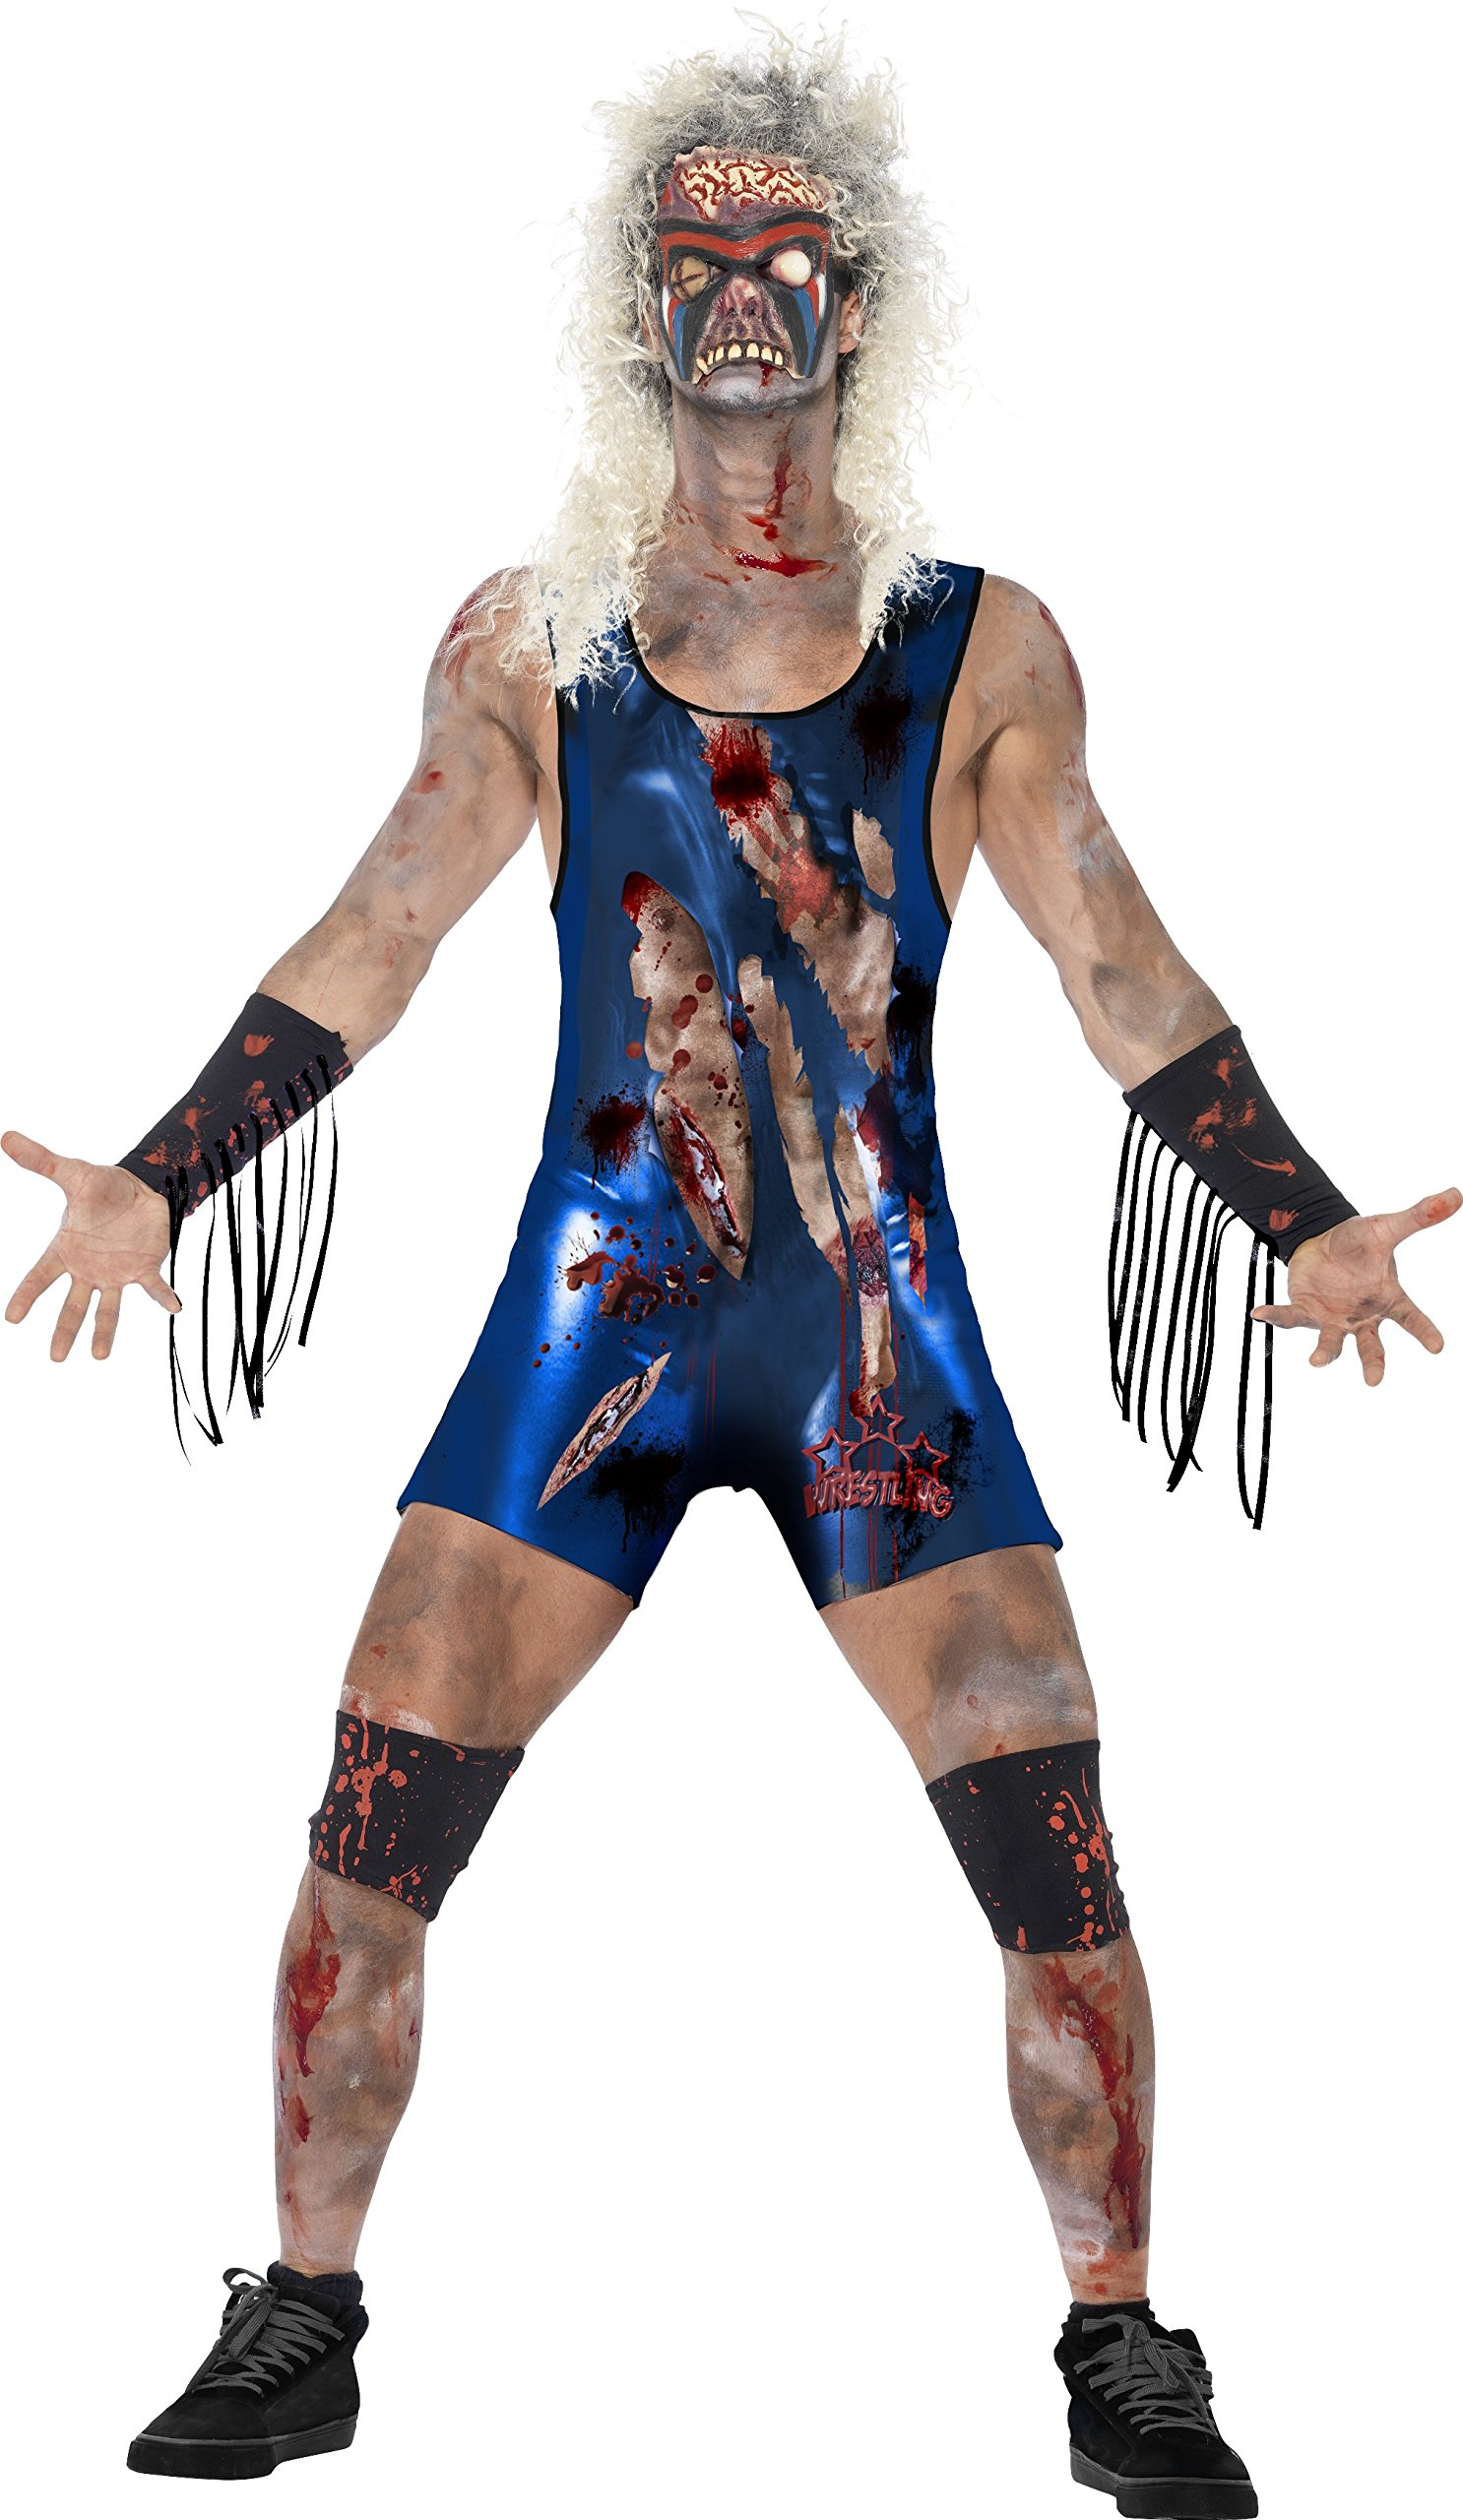 Smiffy's Men's Zombie Wrestler Costume, Bodysuit, Latex Mask, Leg and Arm Cuffs, Zombie Alley, Halloween, Size M, 44358